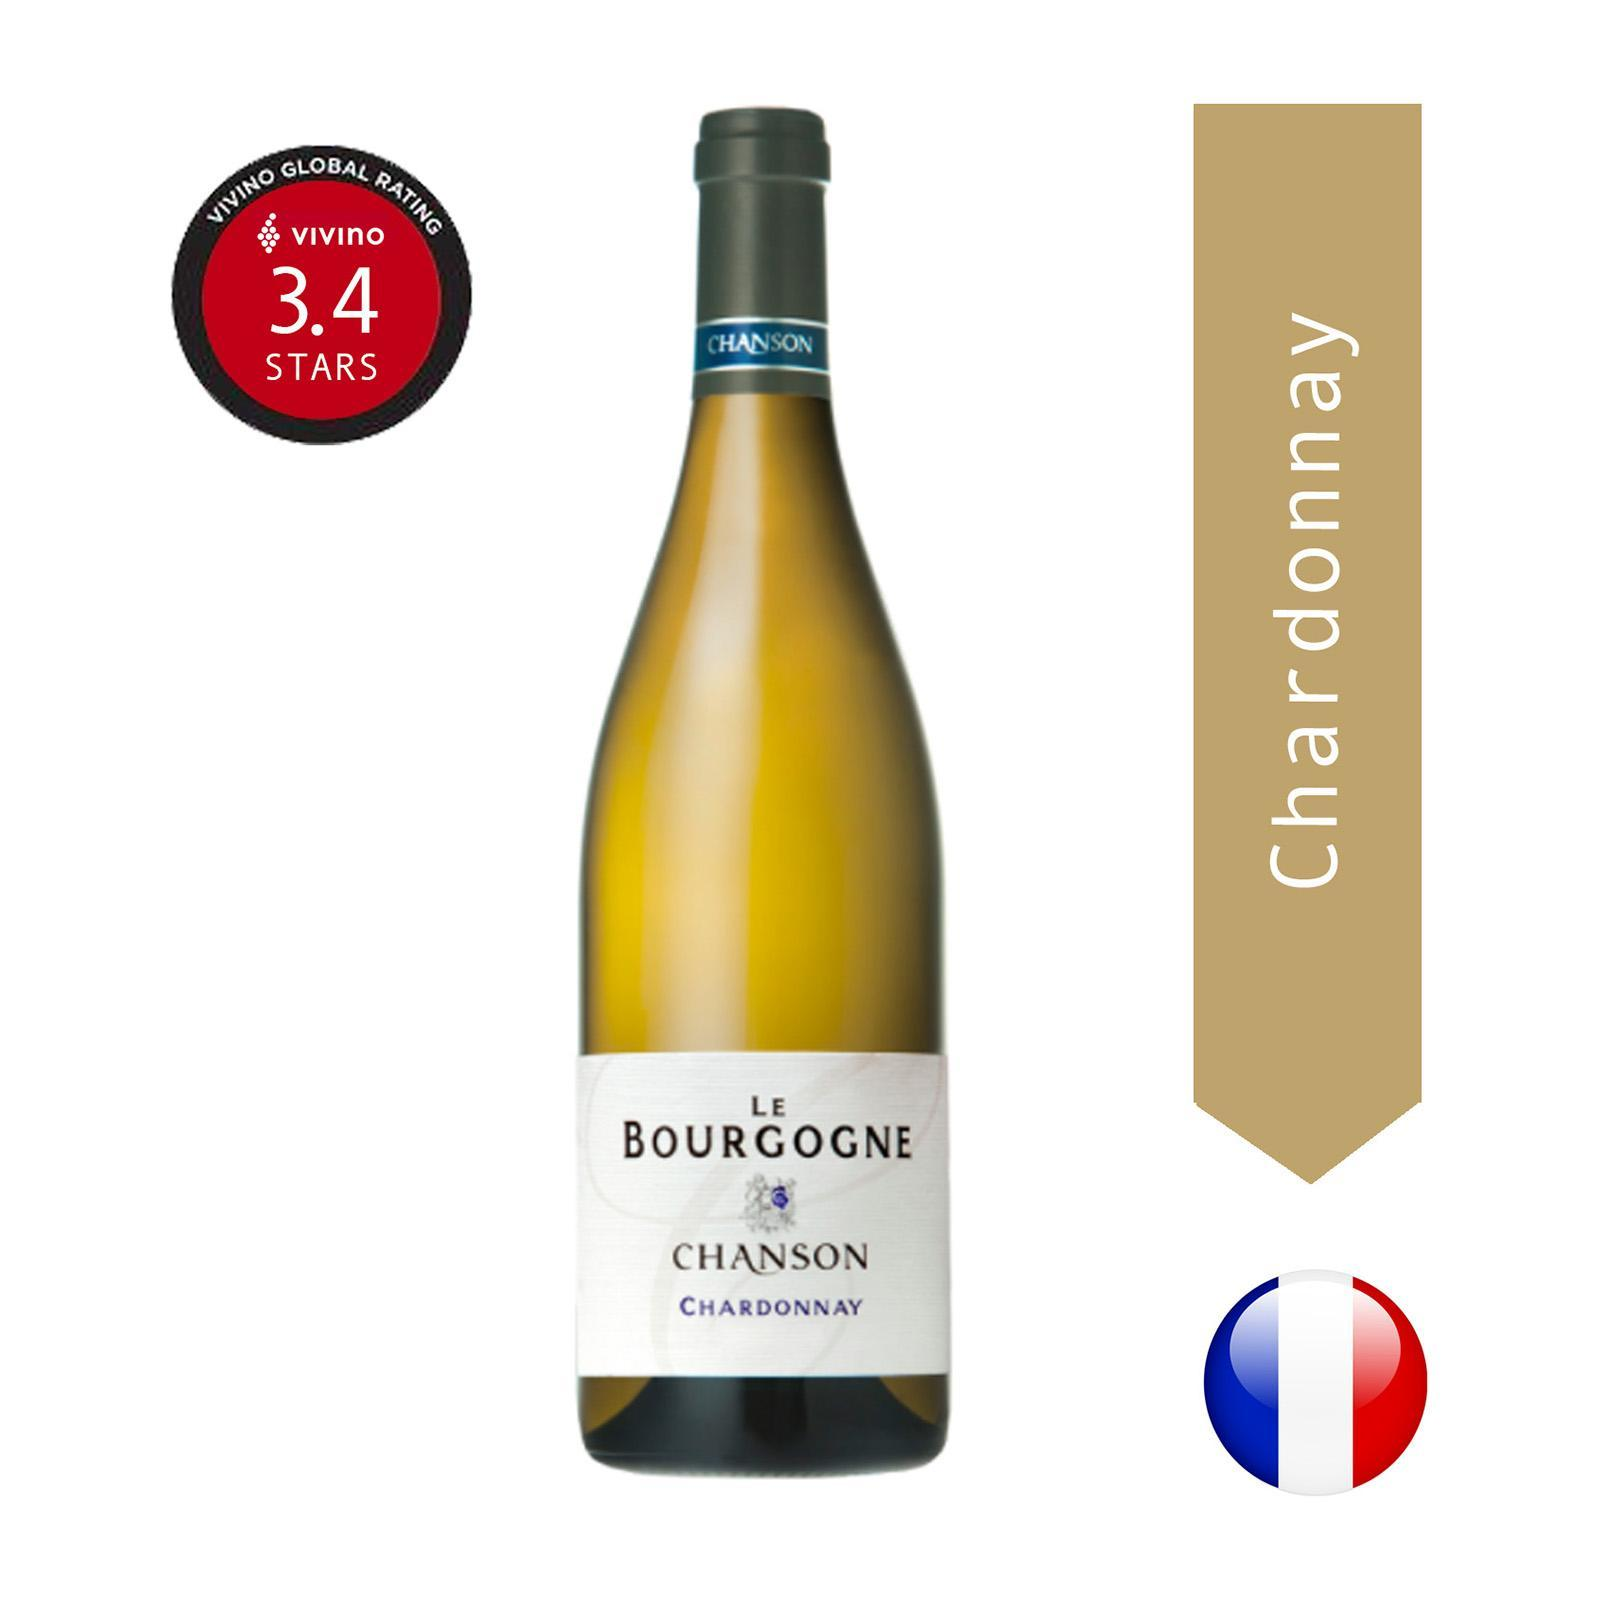 Chanson - Bourgogne Chardonnay - White Wine - Burgundy - By The Vintage Wine Club